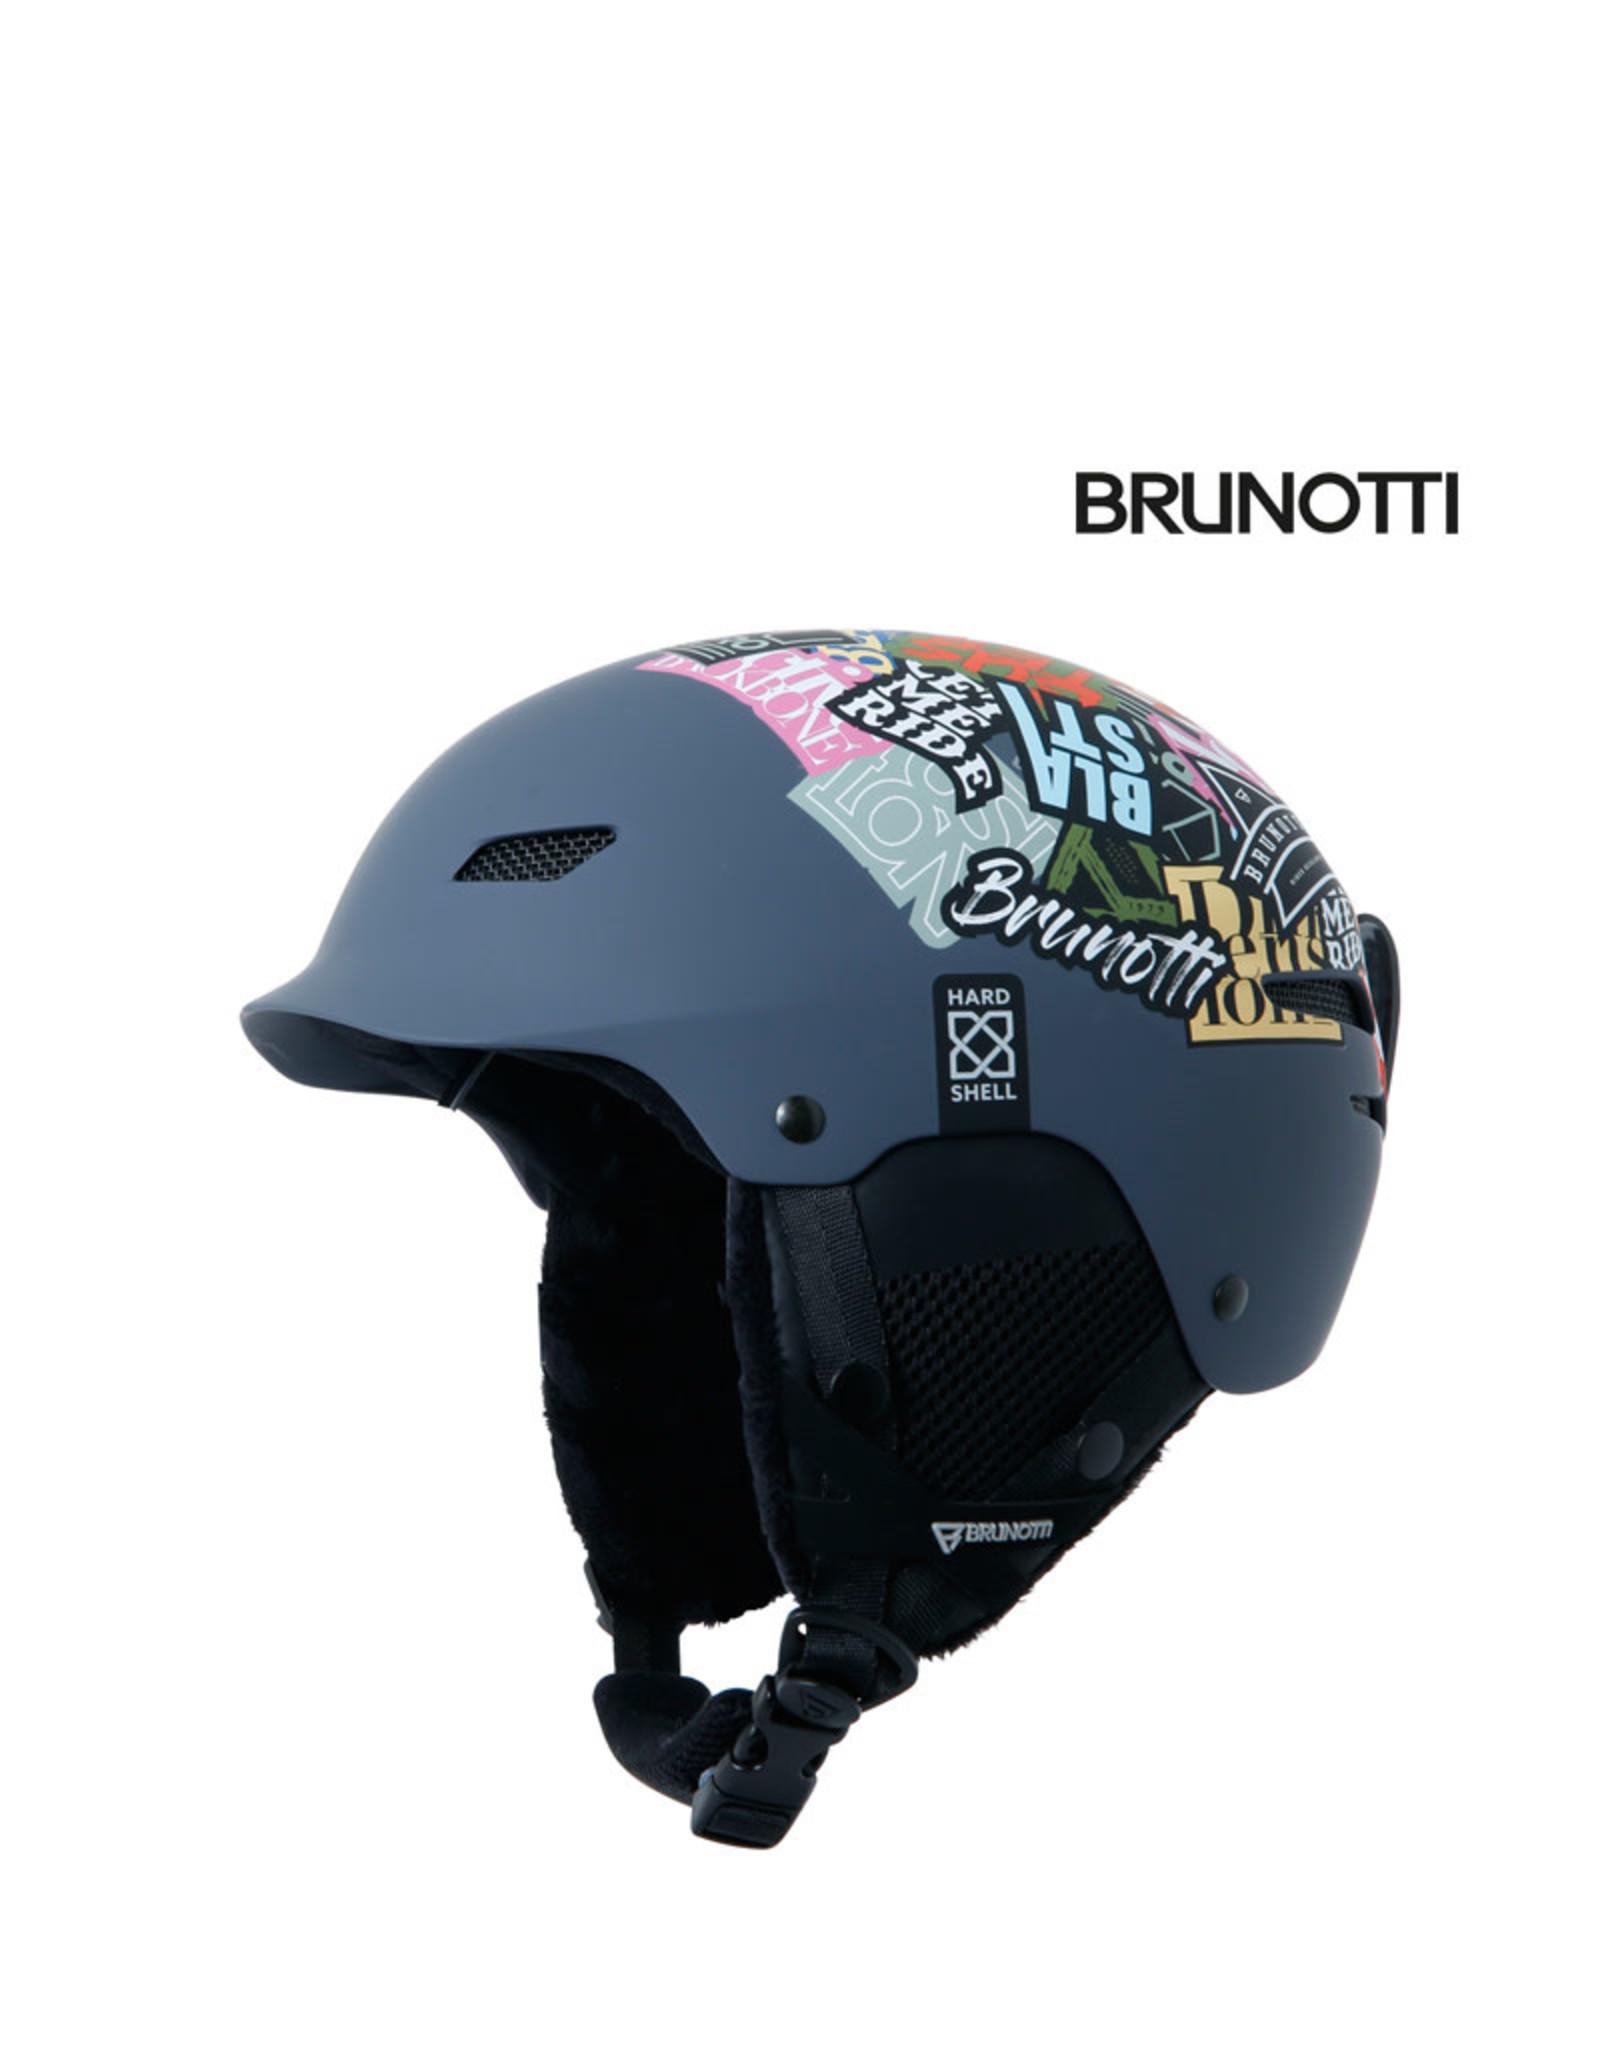 BRUNOTTI Helm Brunotti Proxima 2 52/56 Kids Titanium